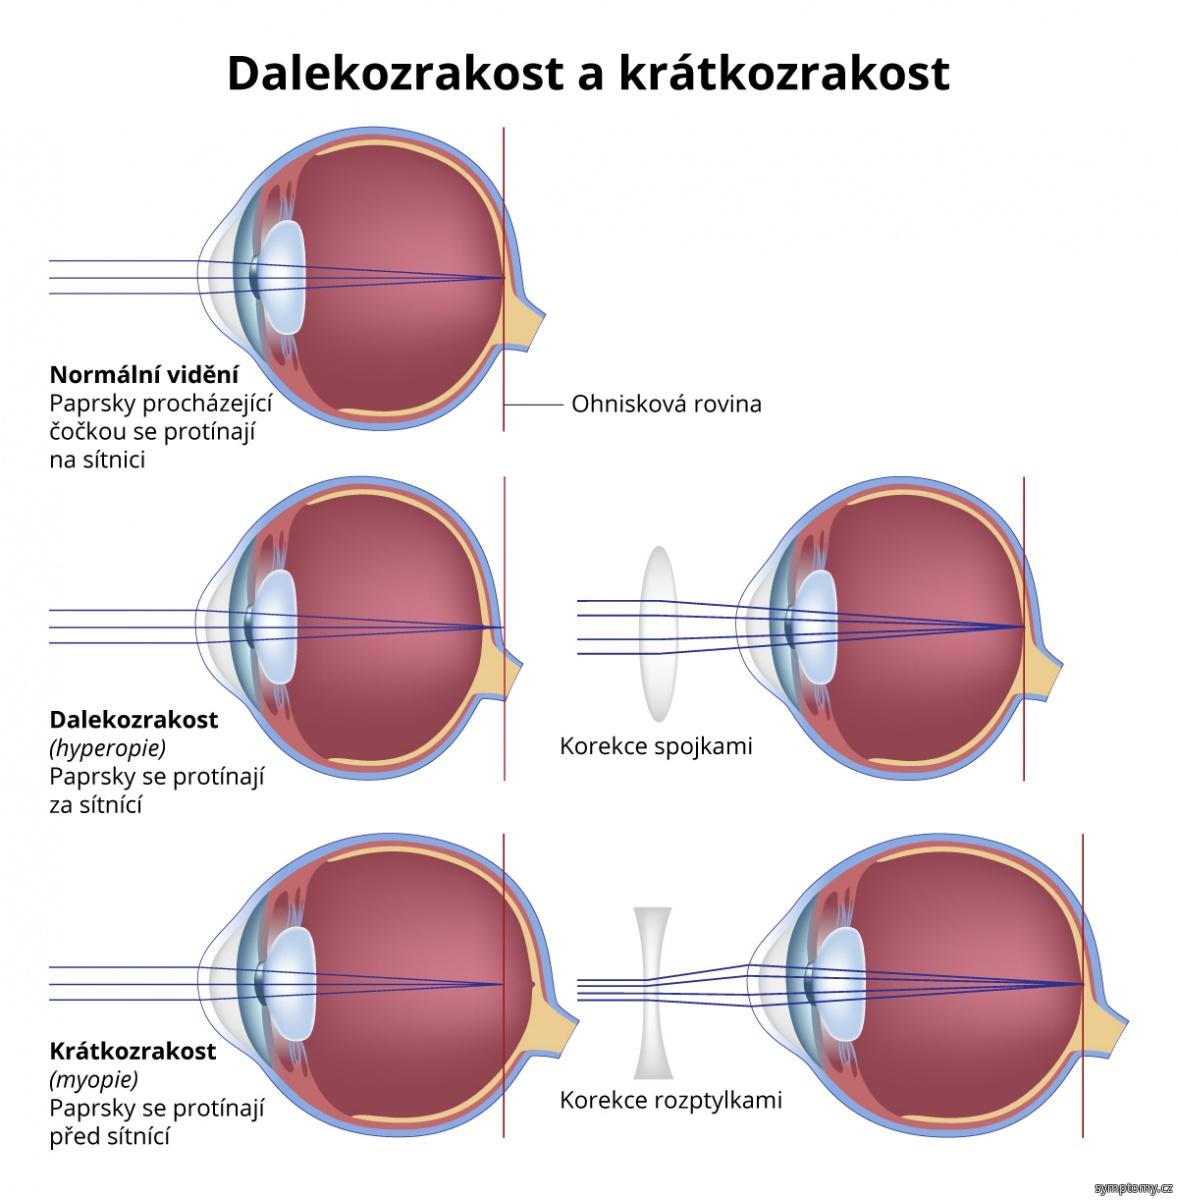 Dalekozrakost a krátkozrakost